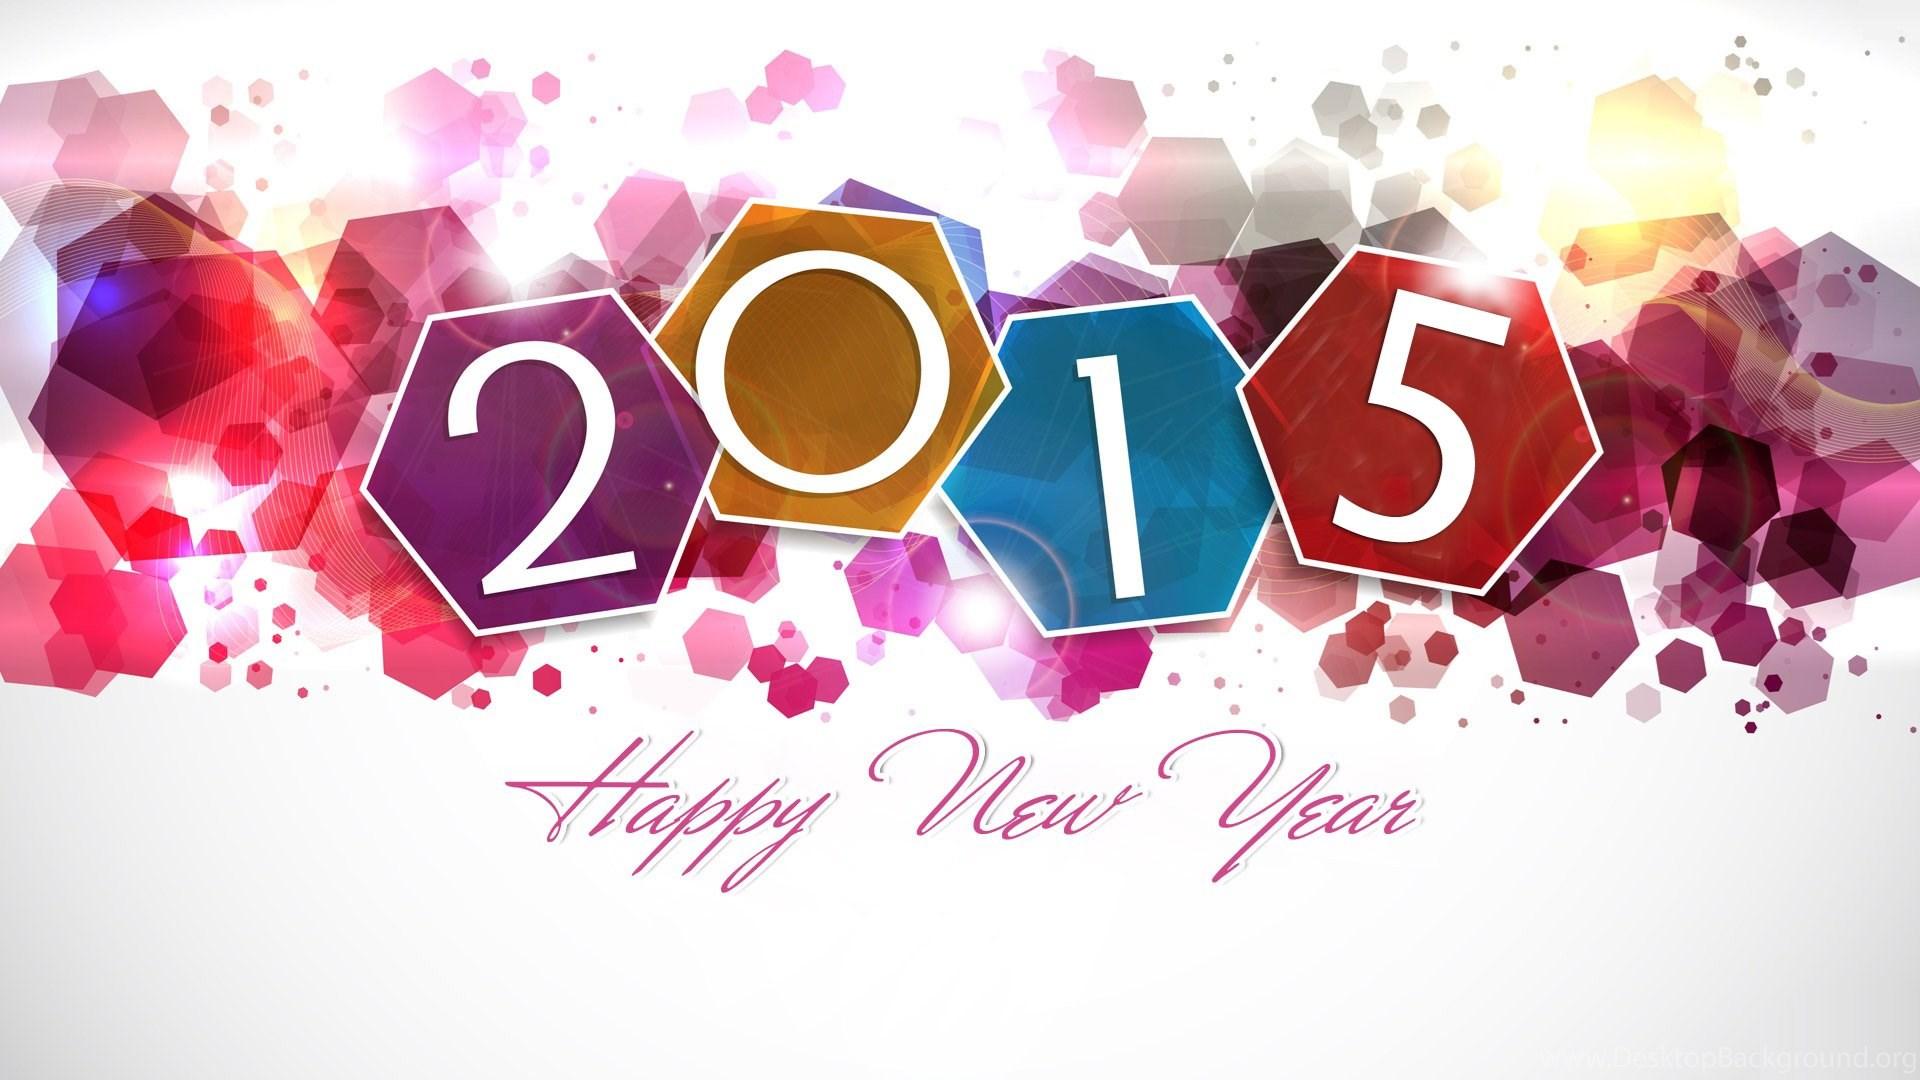 Happy New Year 2016 Hd Wallpapers Windows 10 Wallpapers Desktop